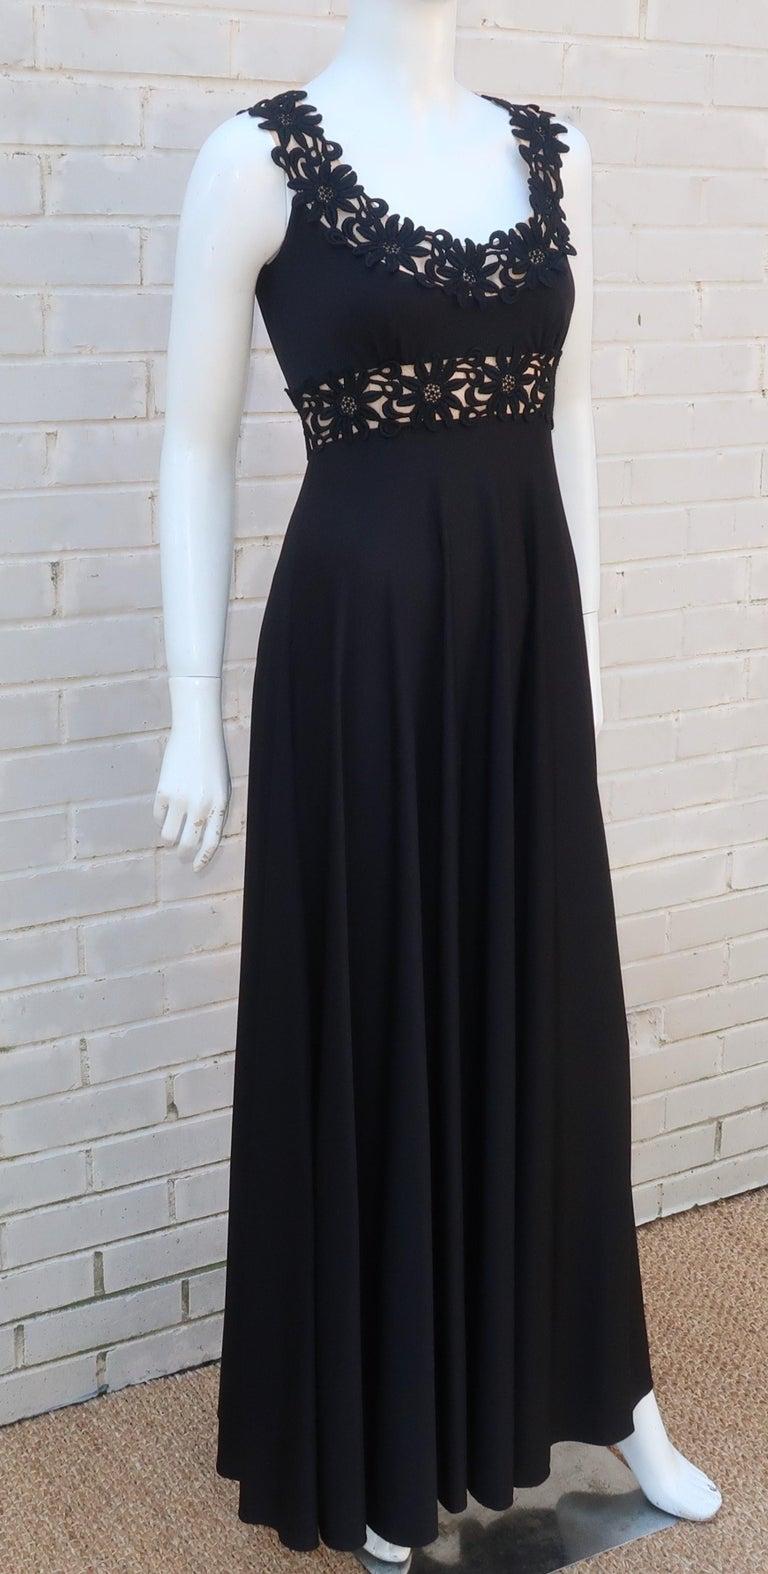 Lillie Rubin Black Jersey Nude Illusion Maxi Evening Dress, C.1970 For Sale 4